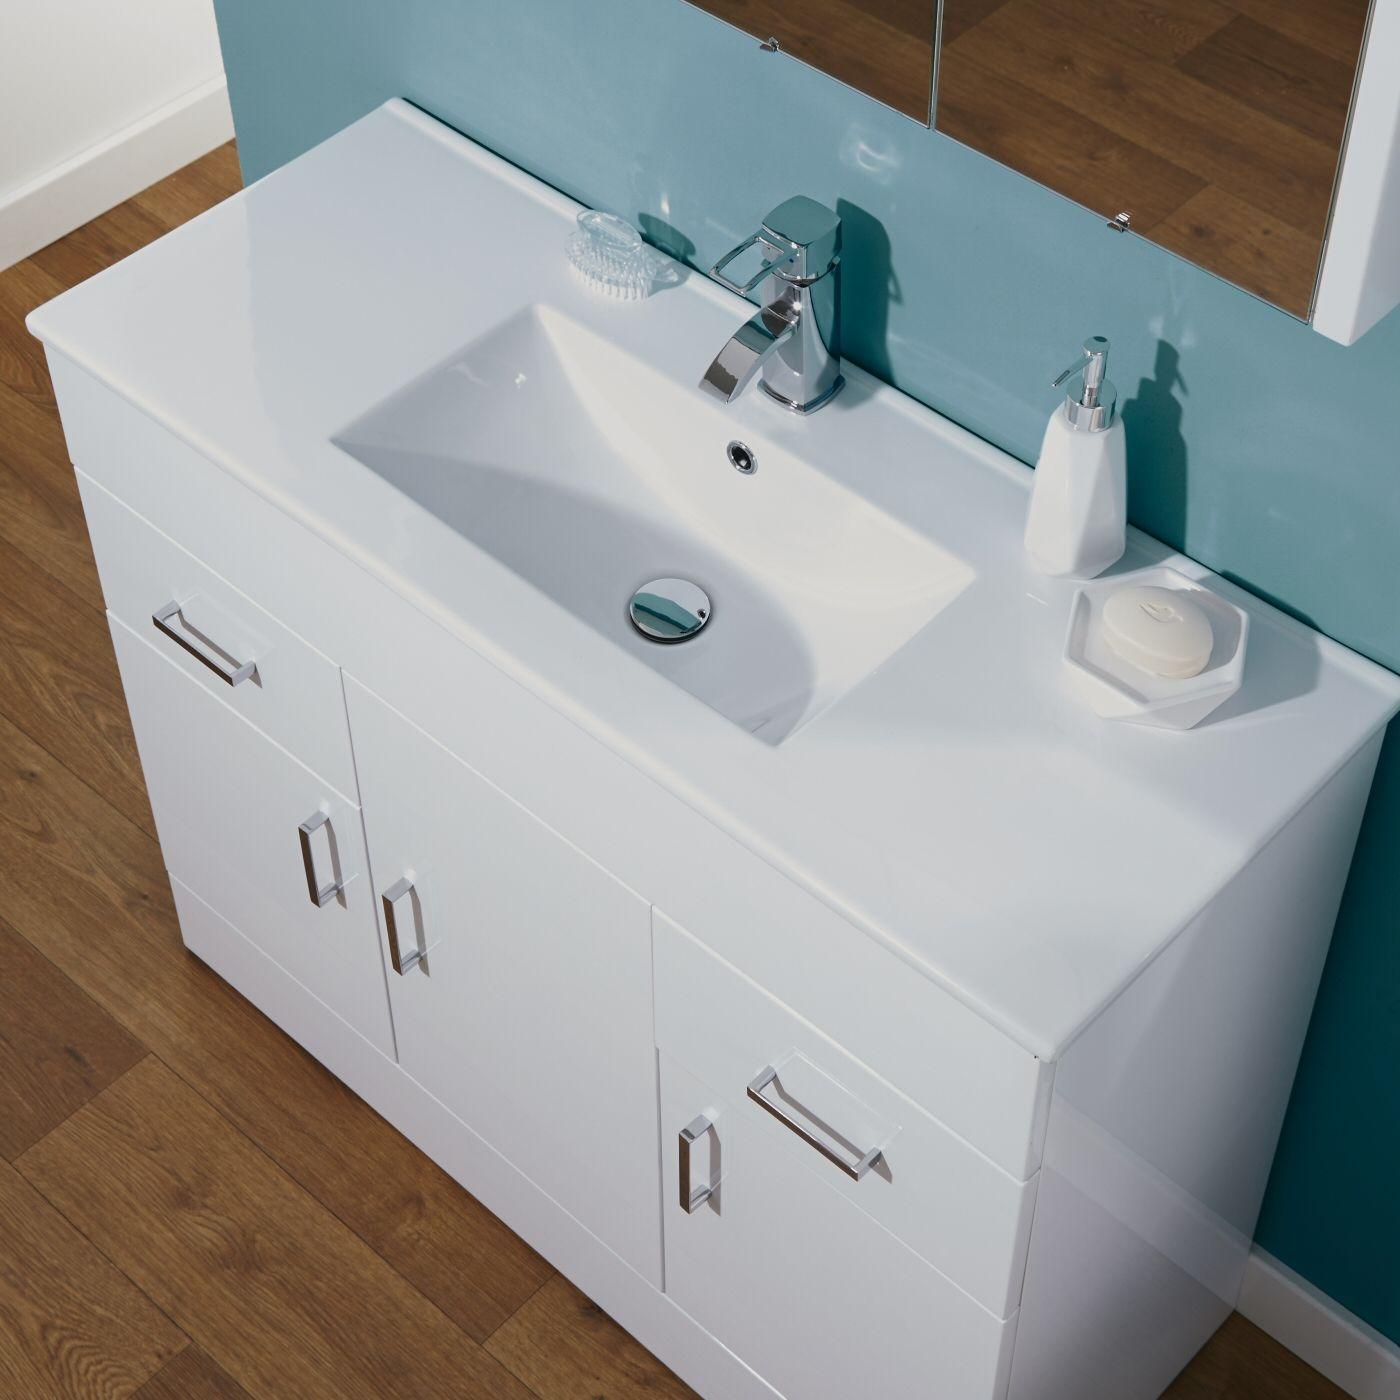 Milano Ren White 1000mm Minimalist Floor Standing Vanity Unit With Basin Vanity Units Bathroom Vanity Units Basin Vanity Unit